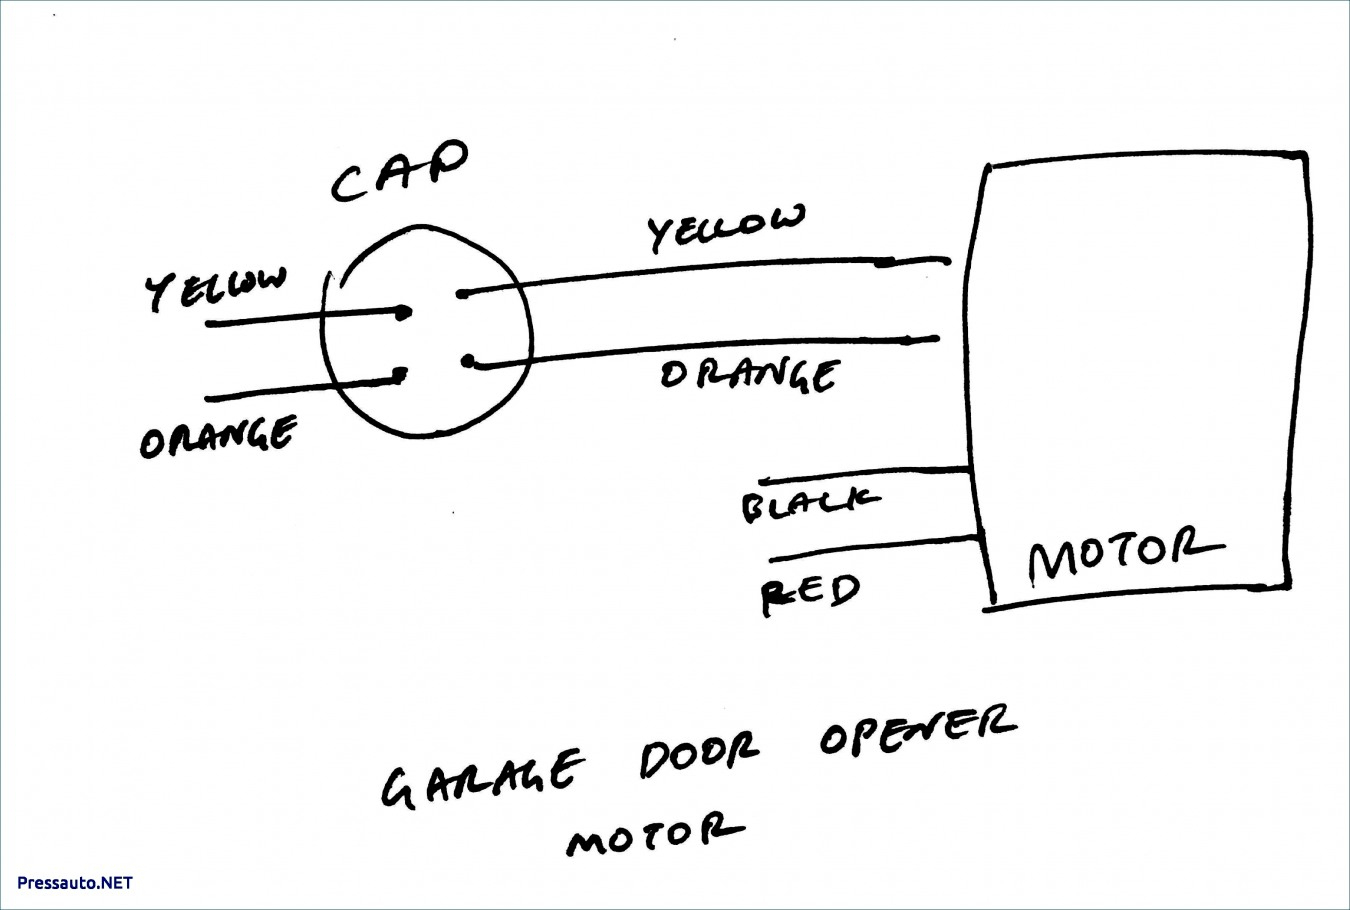 Home Ac Condenser Fan Wiring - All Wiring Diagram Data - 4 Wire Motor Wiring Diagram